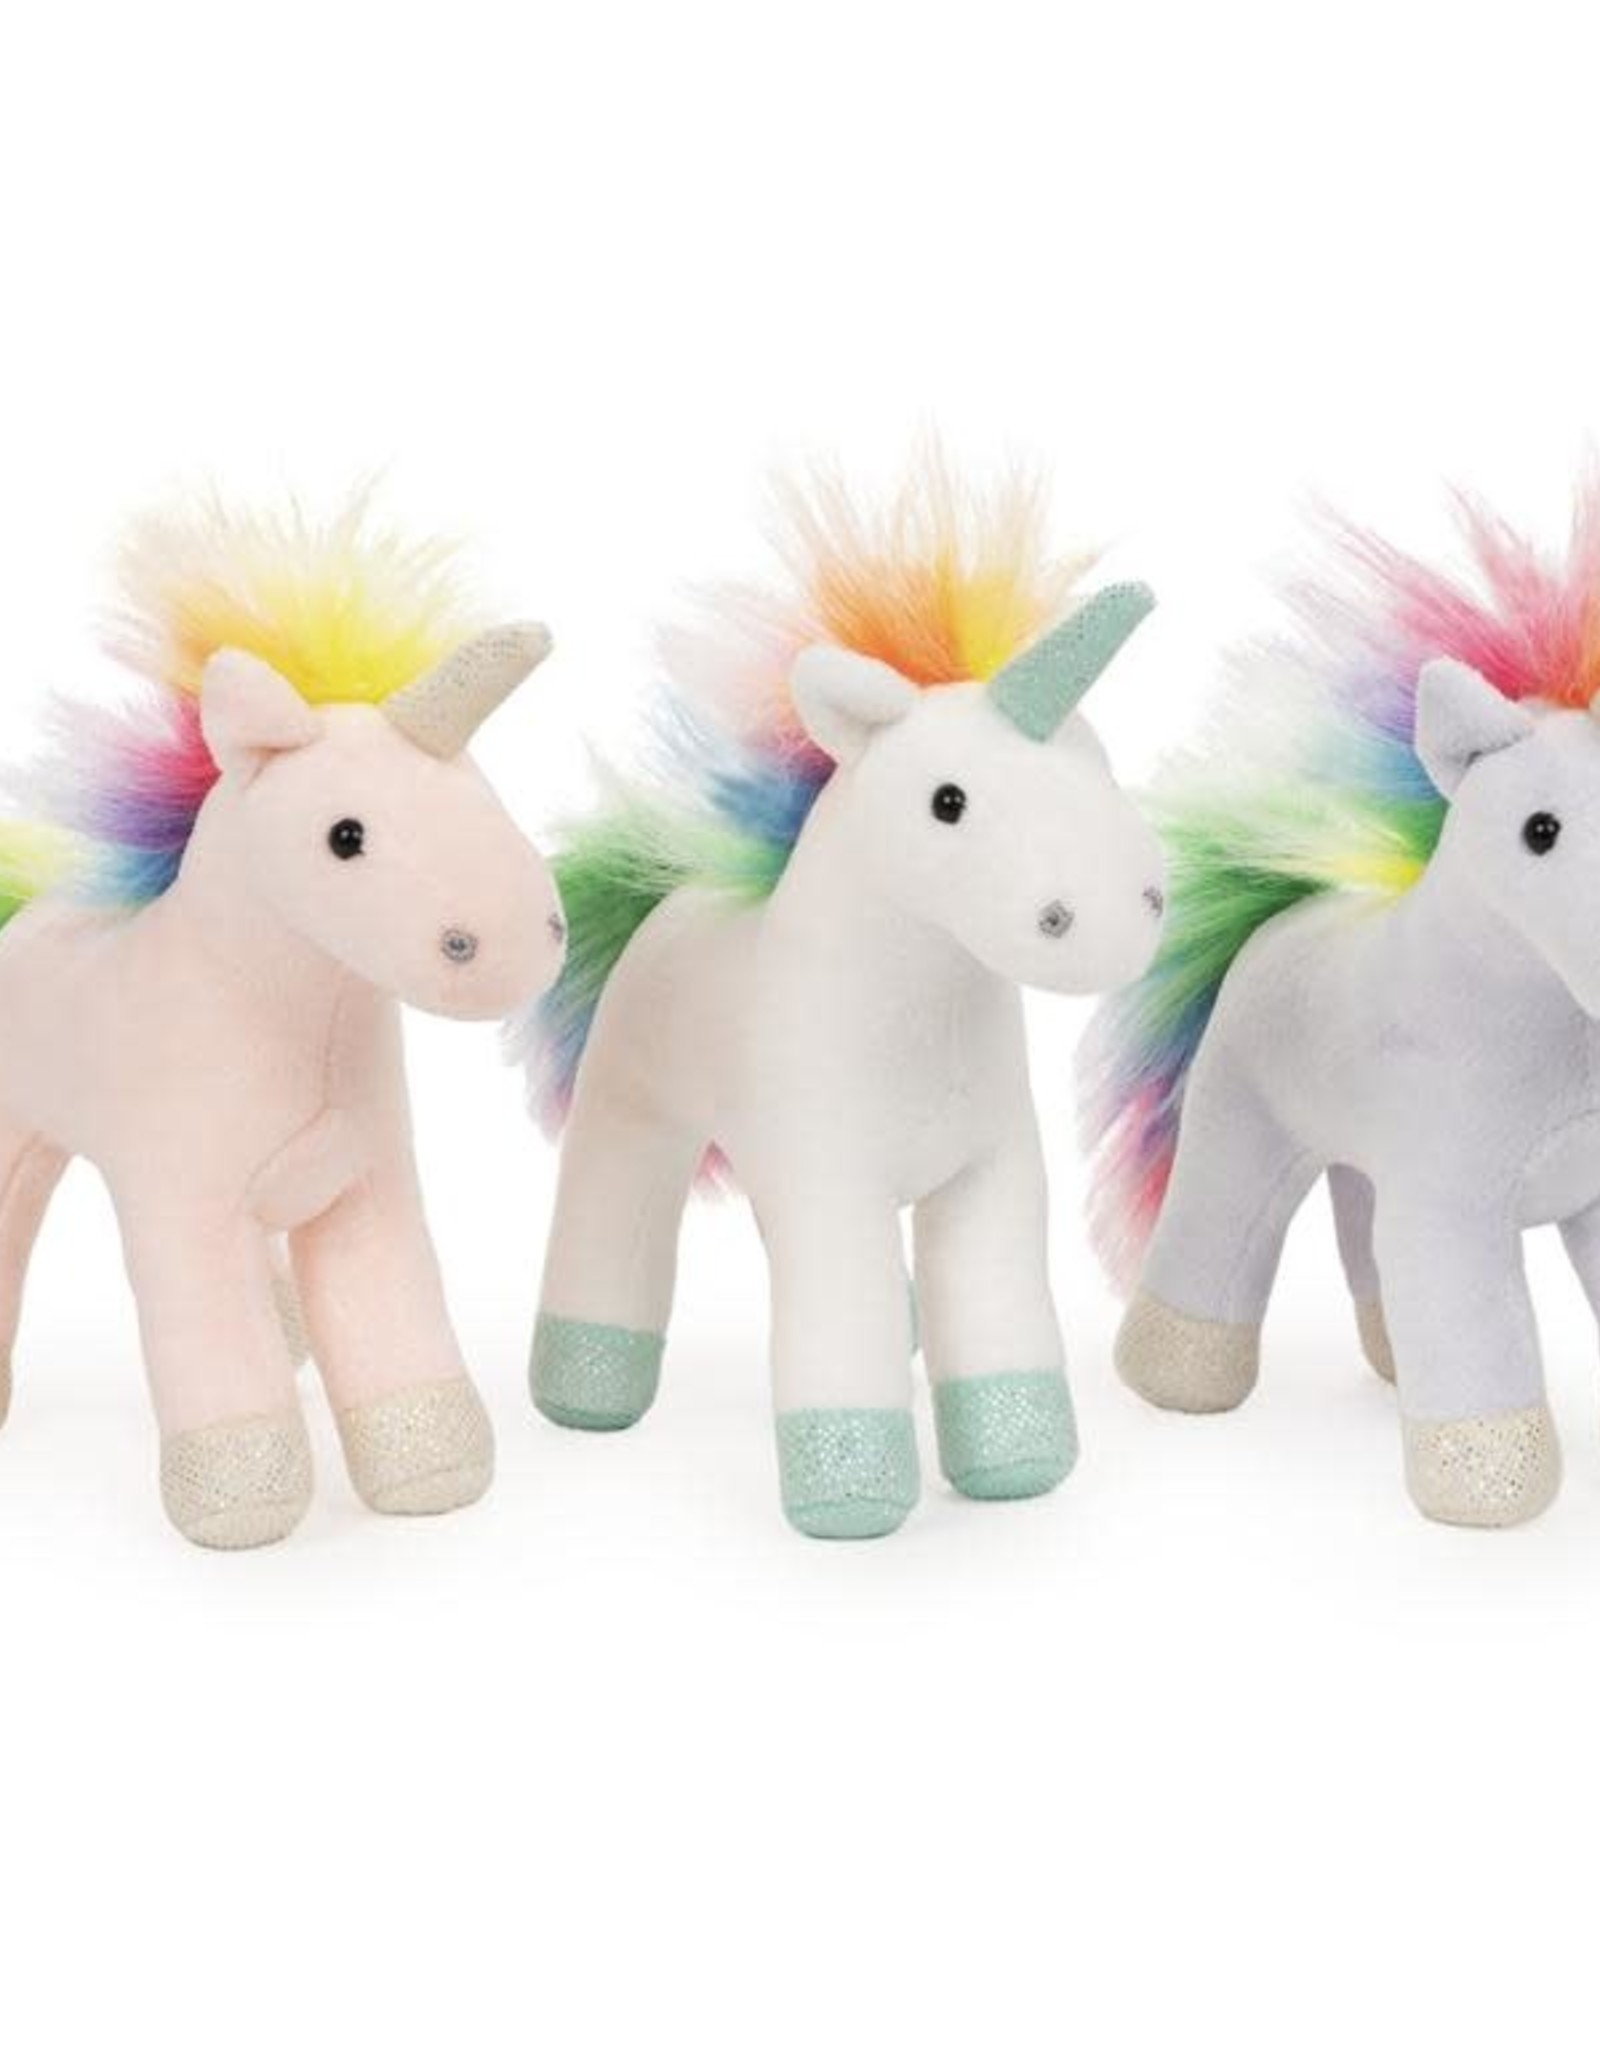 Gund Unicorn Chatters Assorted